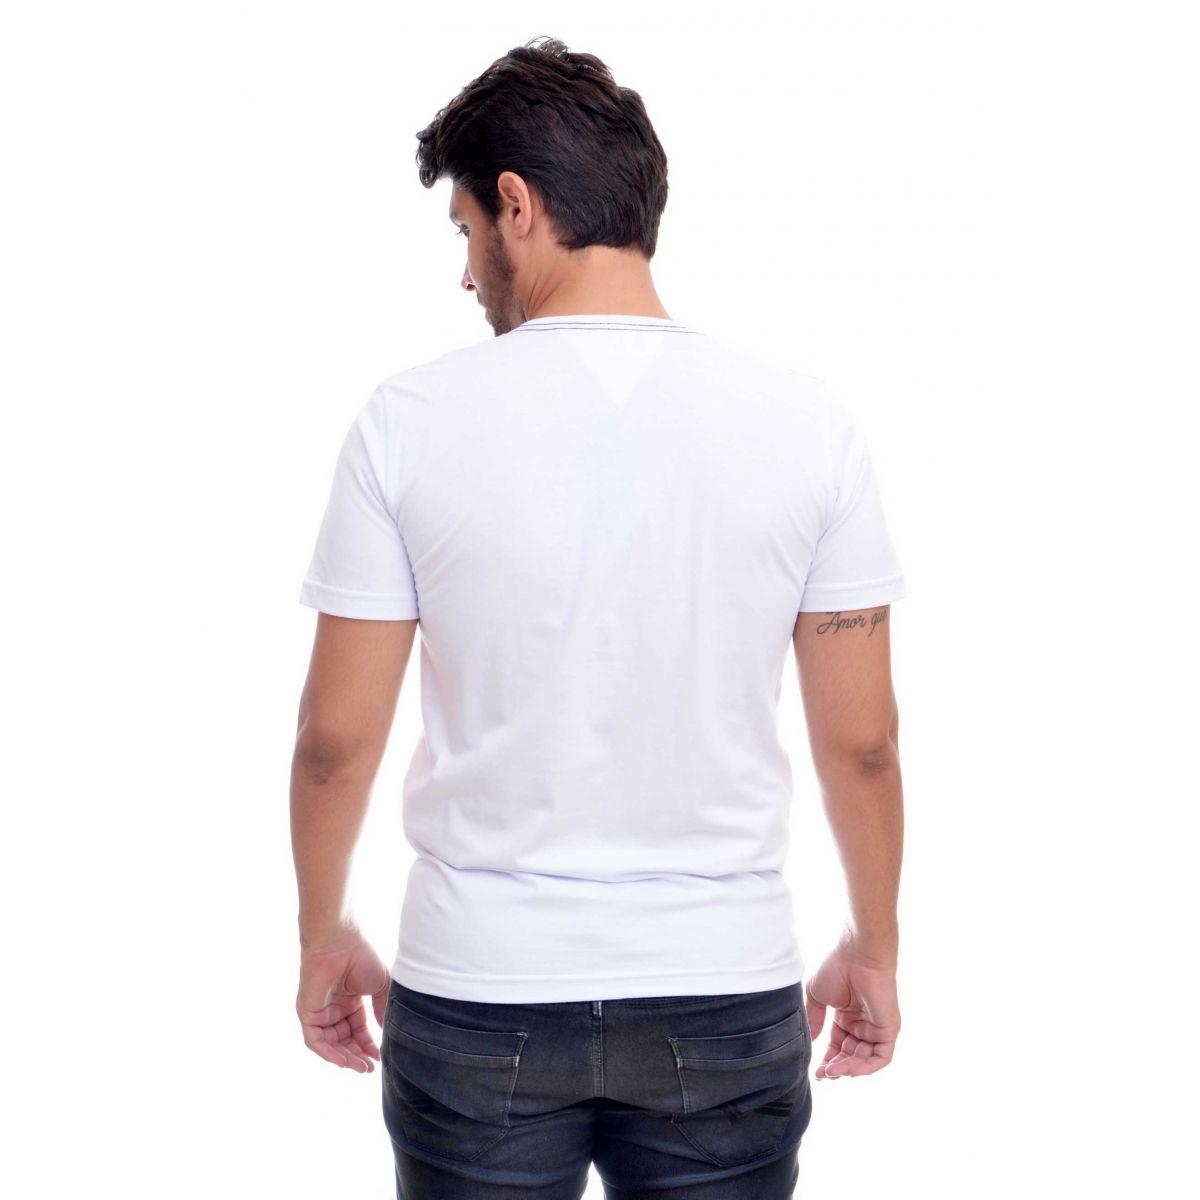 Camiseta TH NY Branca  - Ca Brasileira